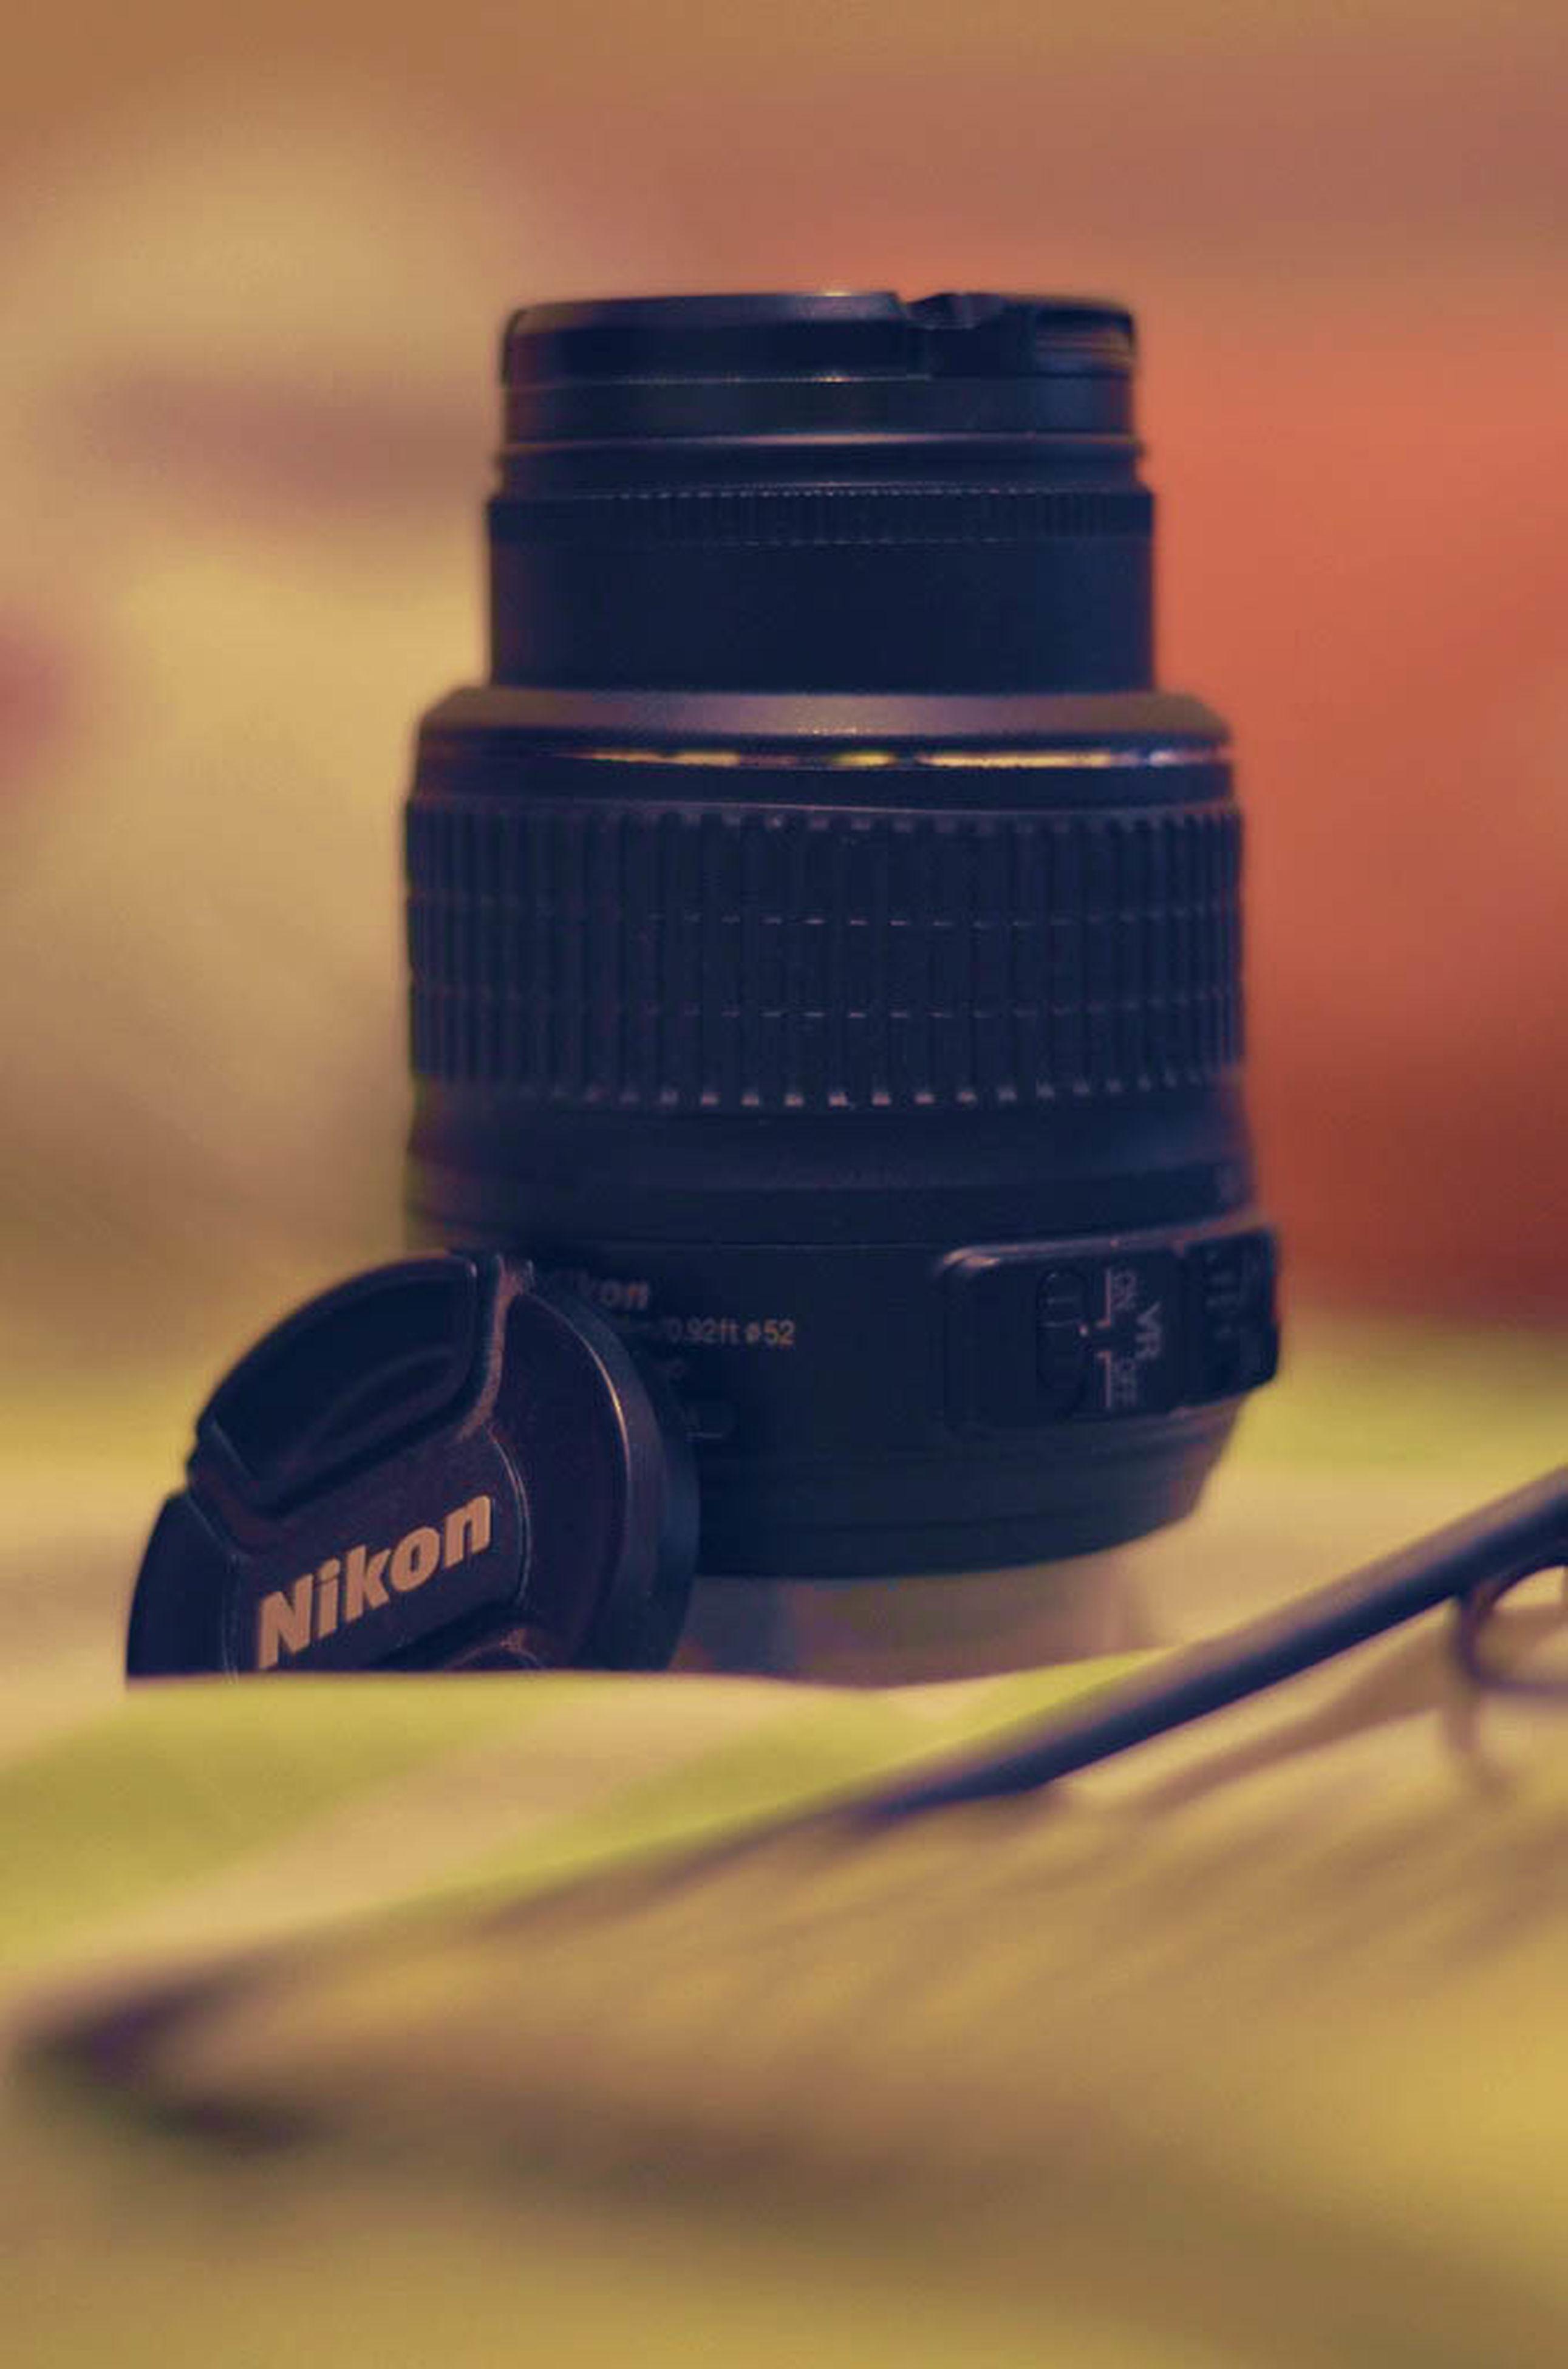 Nikon Nikkor Photography Photographer